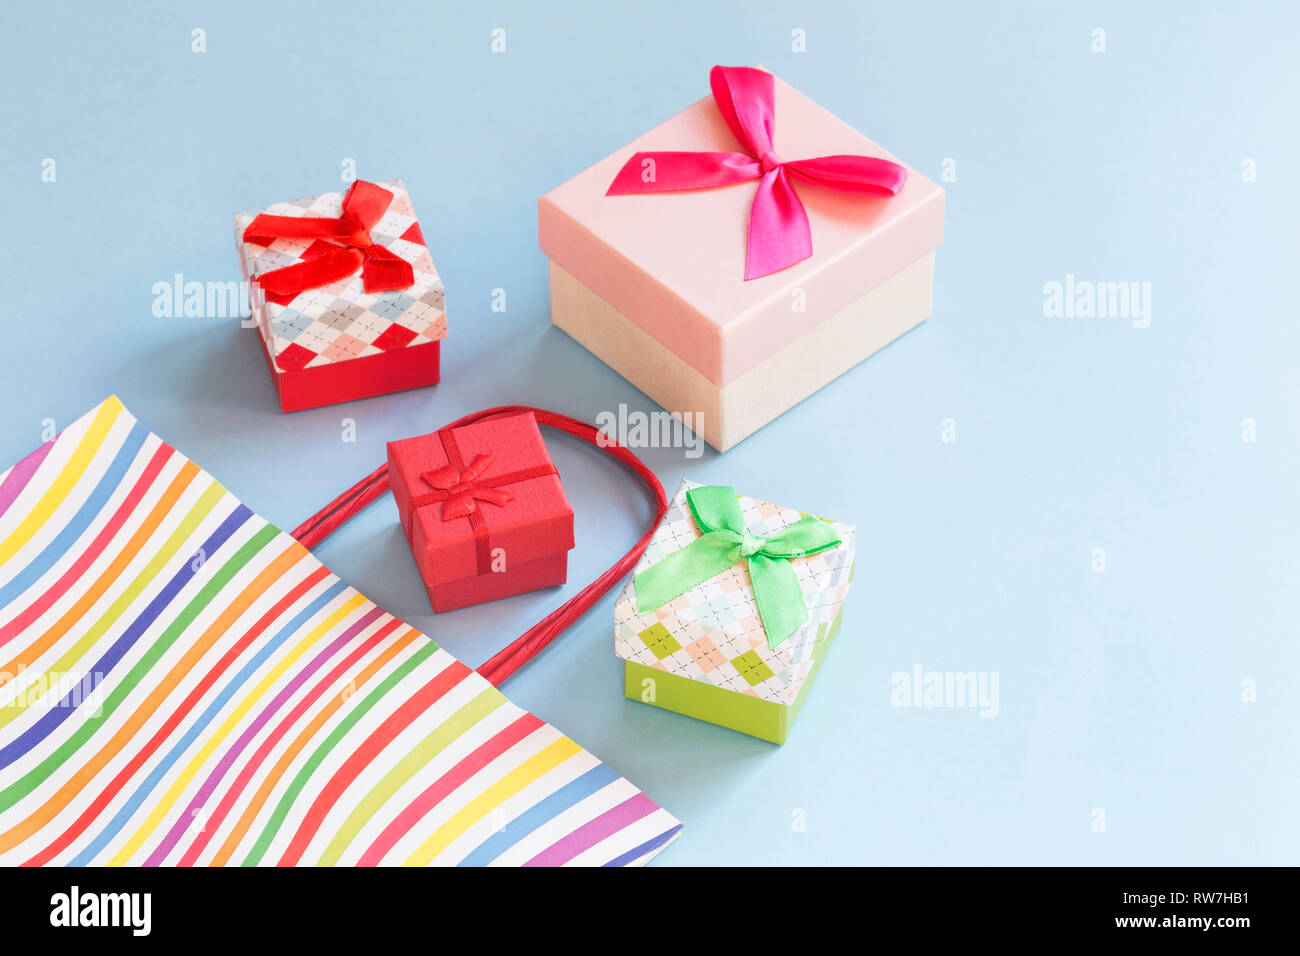 Decorative Gift Boxes Stock Photos Decorative Gift Boxes Stock